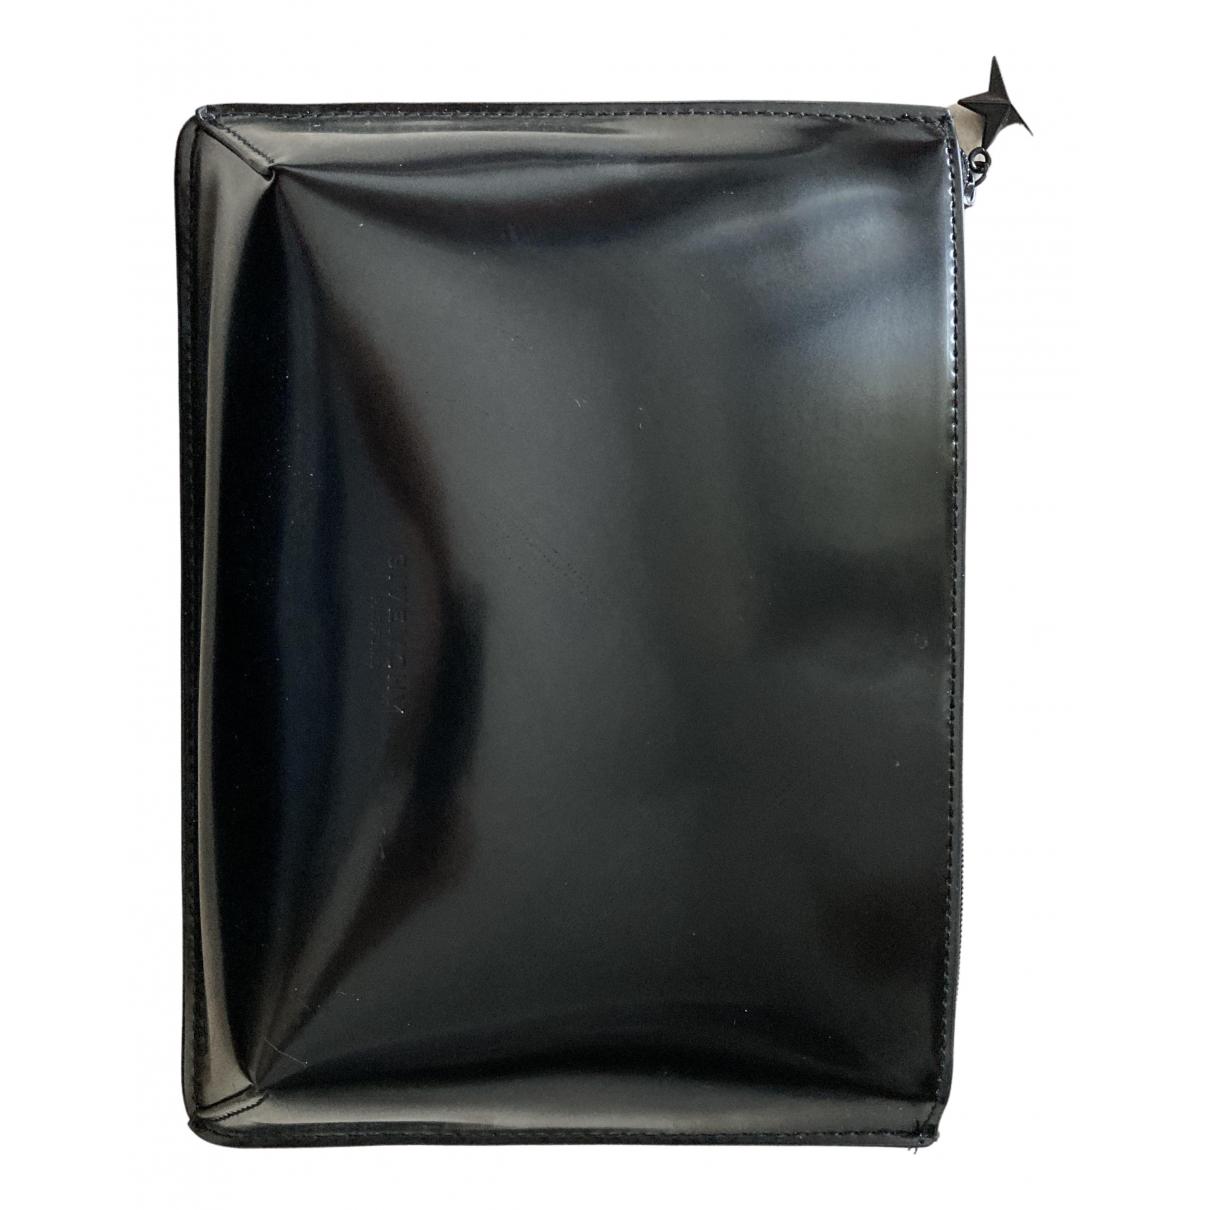 Givenchy \N Clutch in  Schwarz Kunststoff